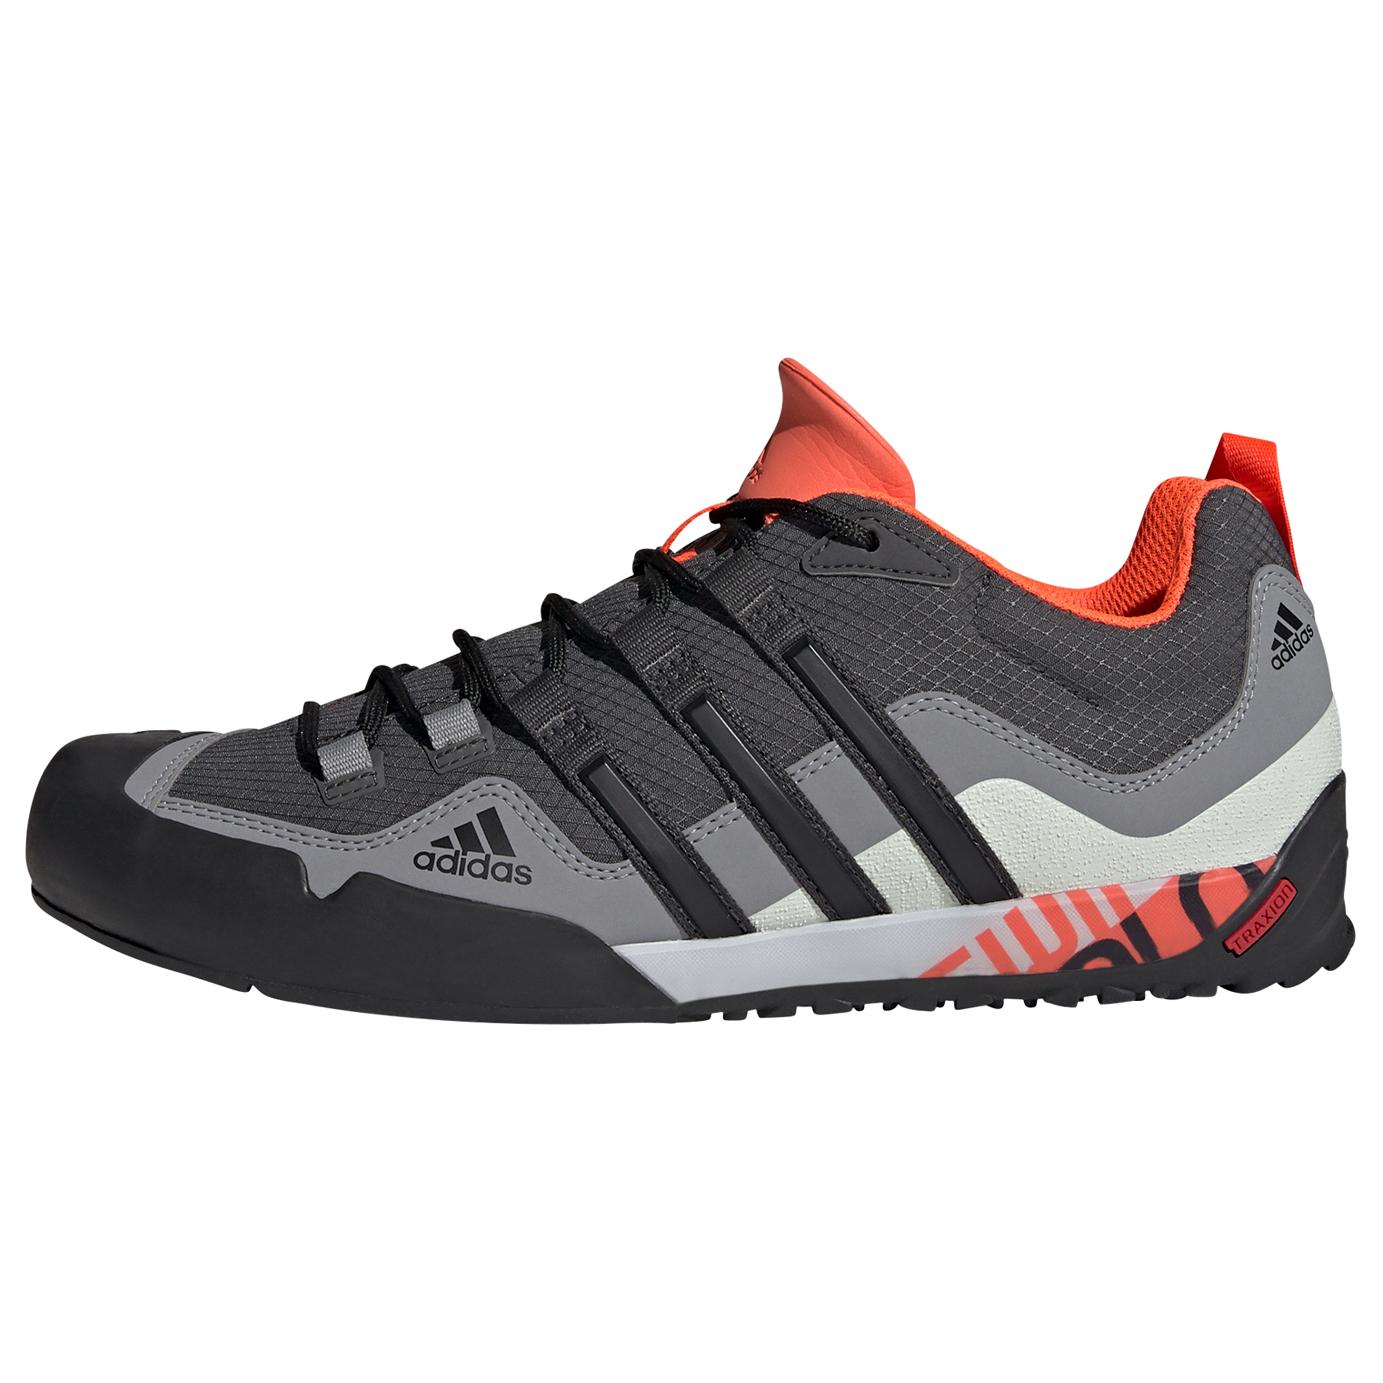 interno esilio ronzio  Adidas Terrex Swift Solo - Approach shoes | Free EU Delivery |  Bergfreunde.eu